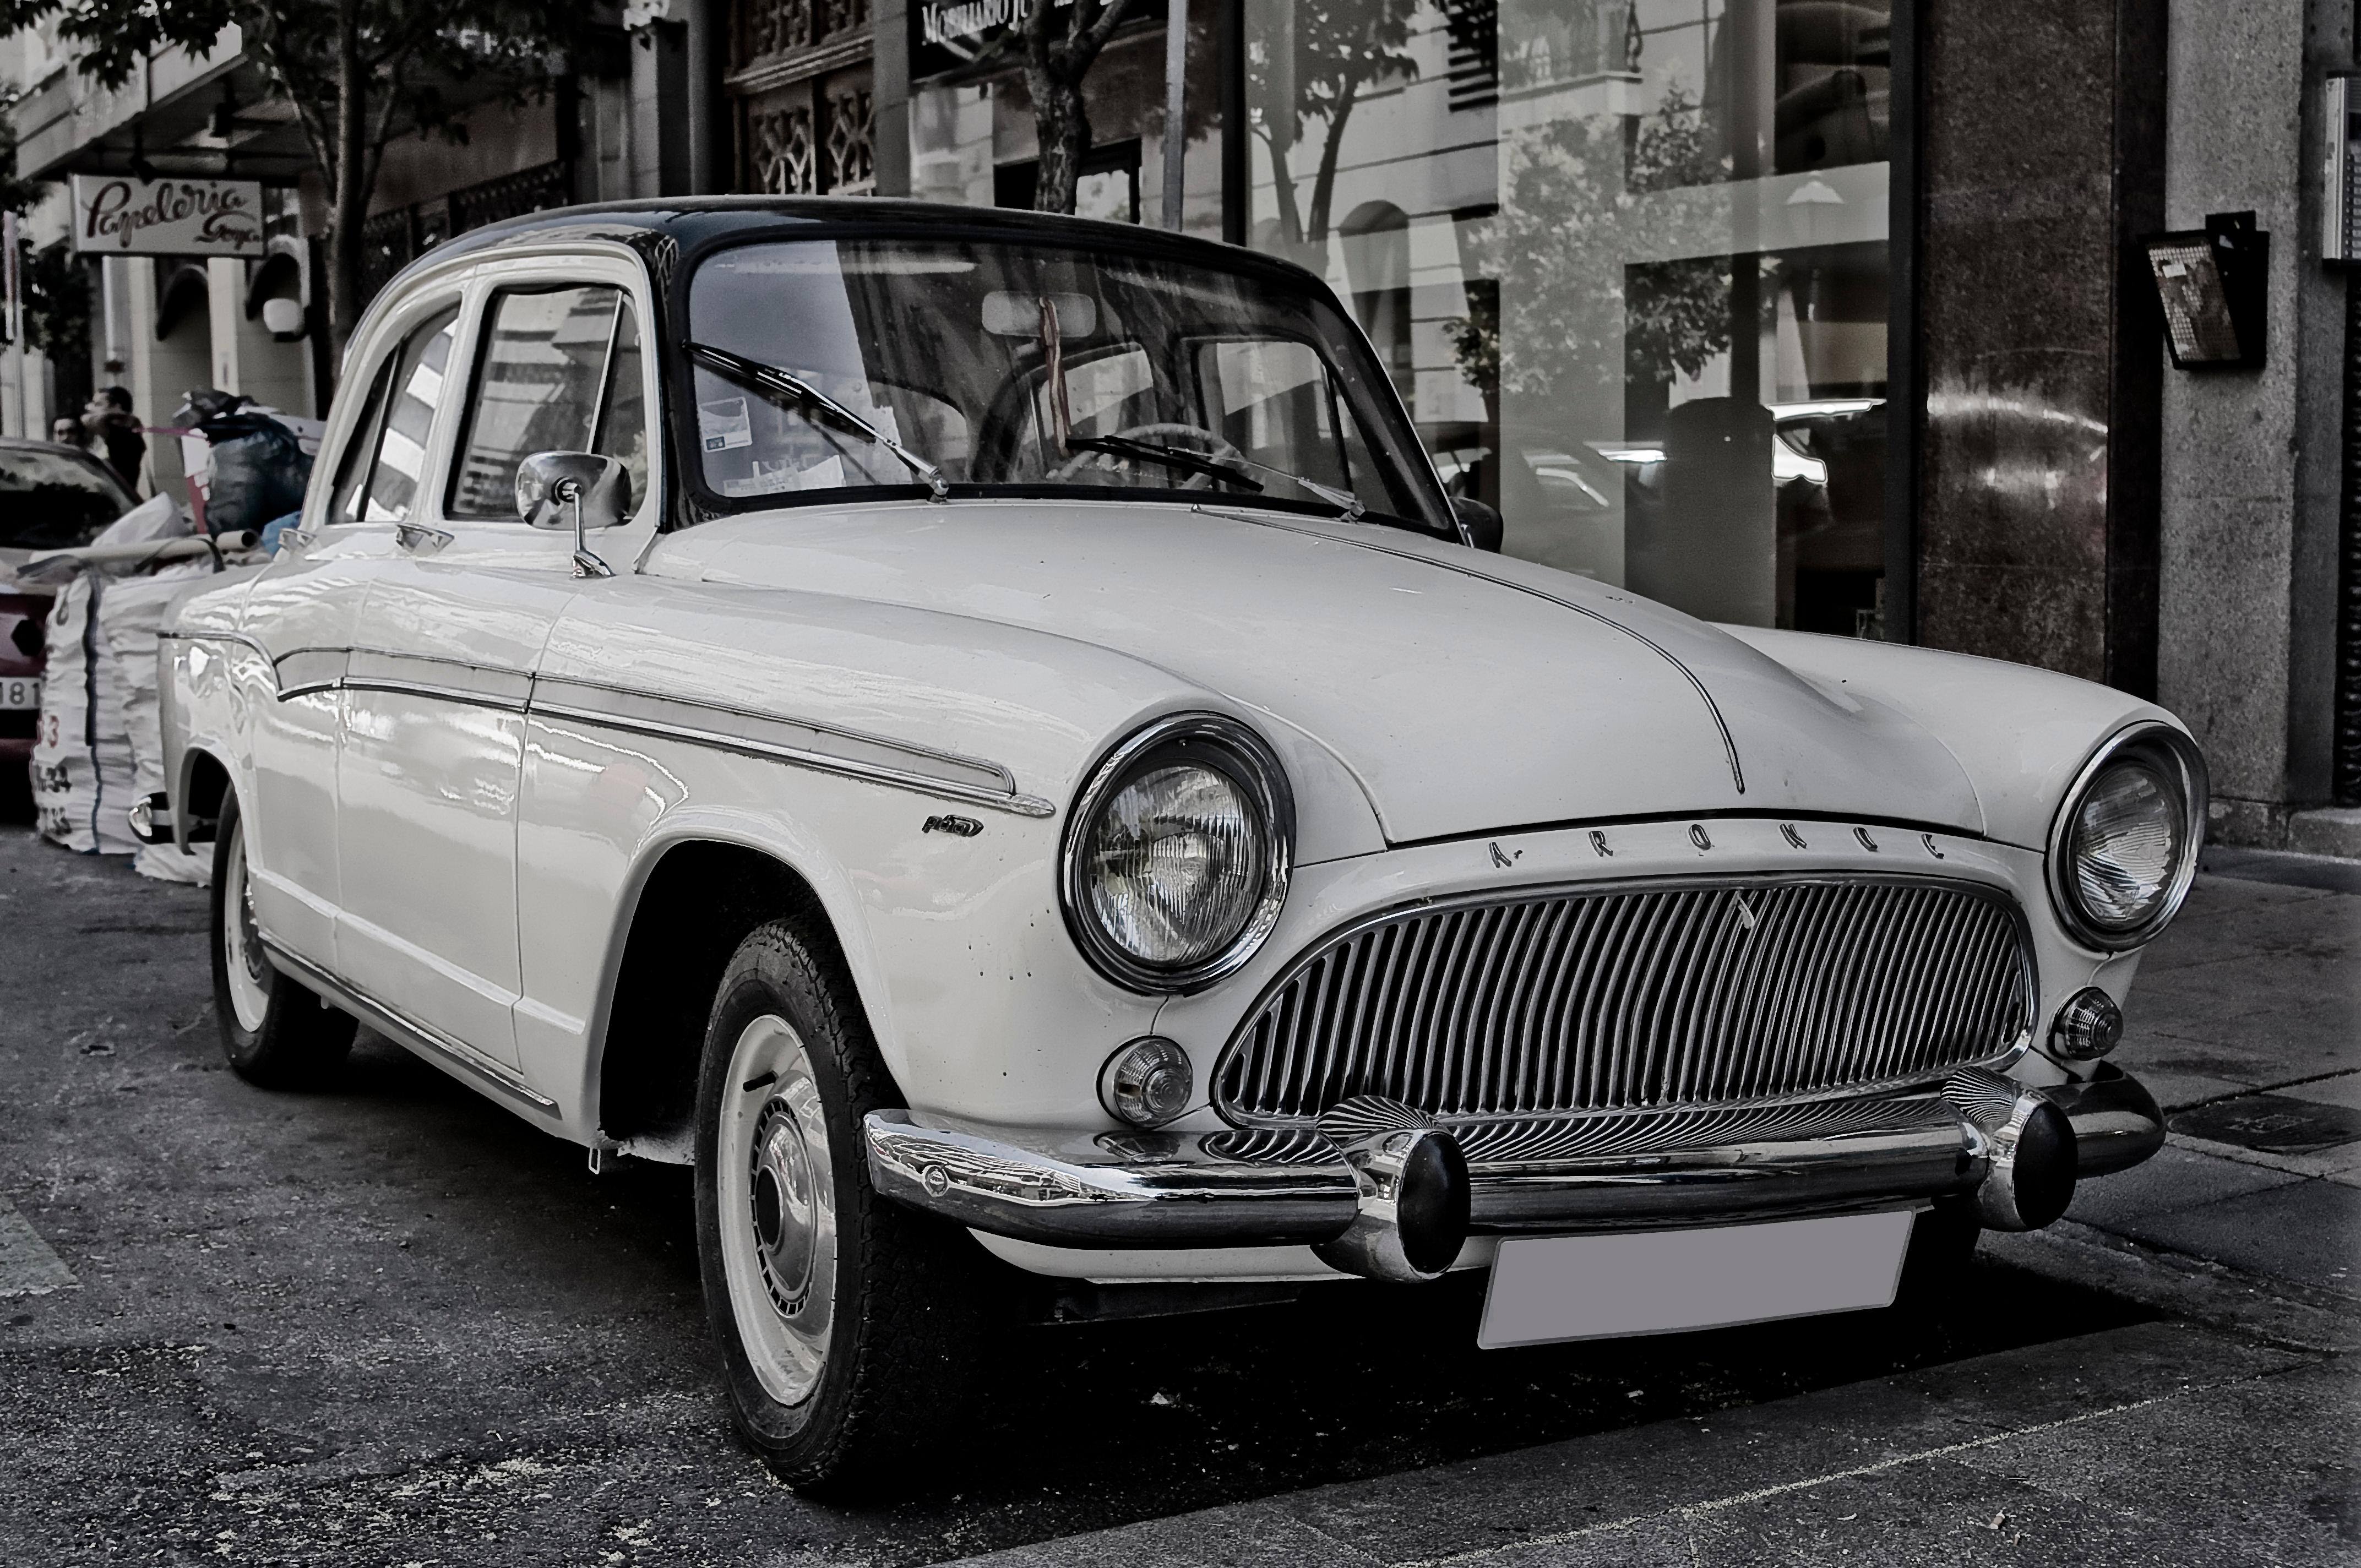 File:1959 Simca Aronde P60 (6330388522).jpg - Wikimedia Commons